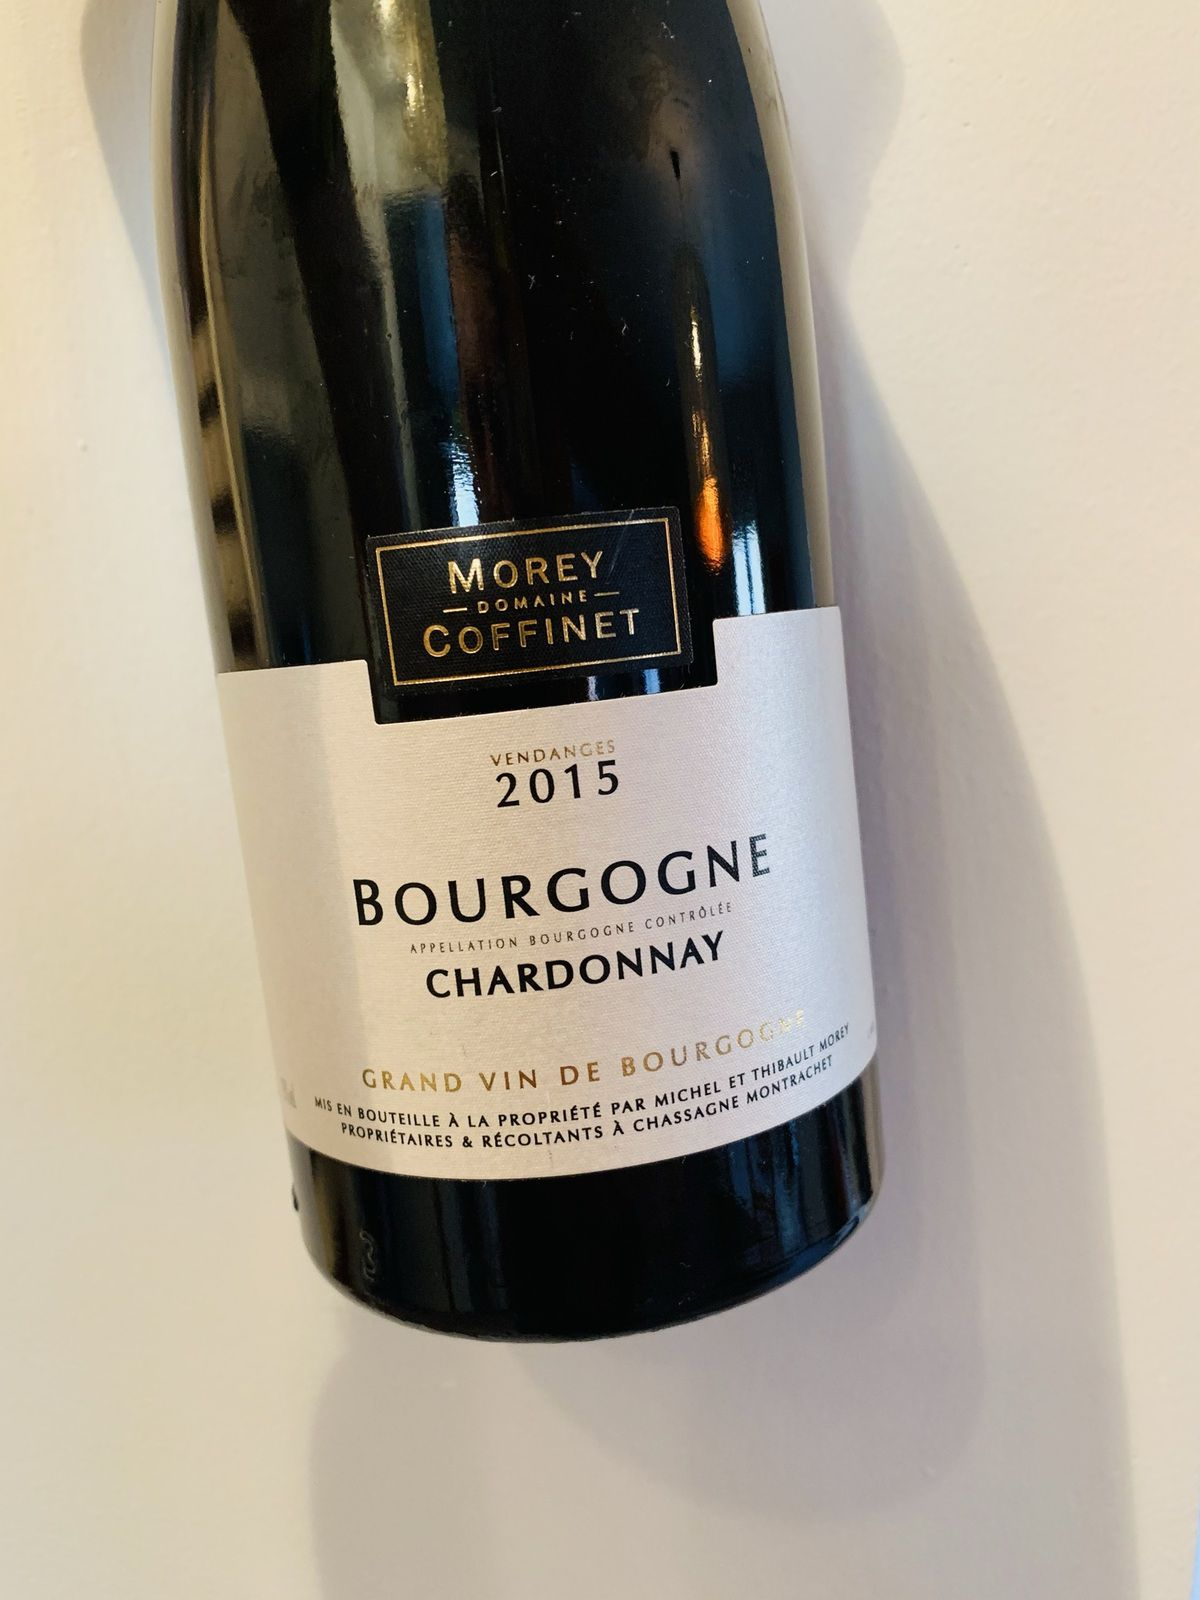 Bourgogne chardonnay 2015 Morey-Coffinet